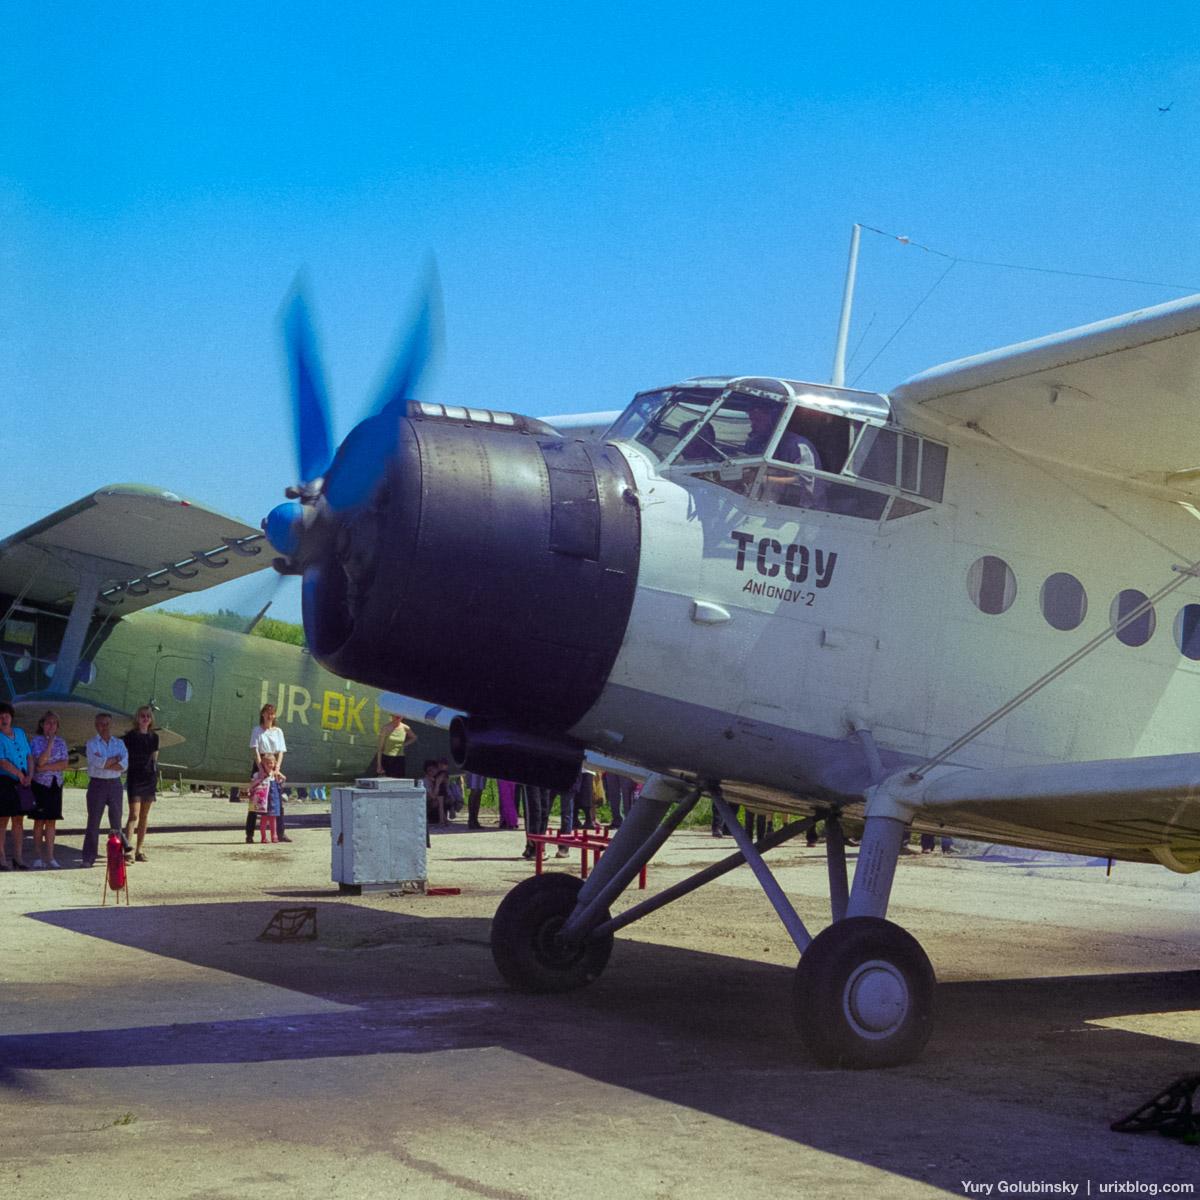 Aeroclub day, Zavodskoye airport, Simferopol, Crimea, Ukraine, Russia, 2001, airplane, airport